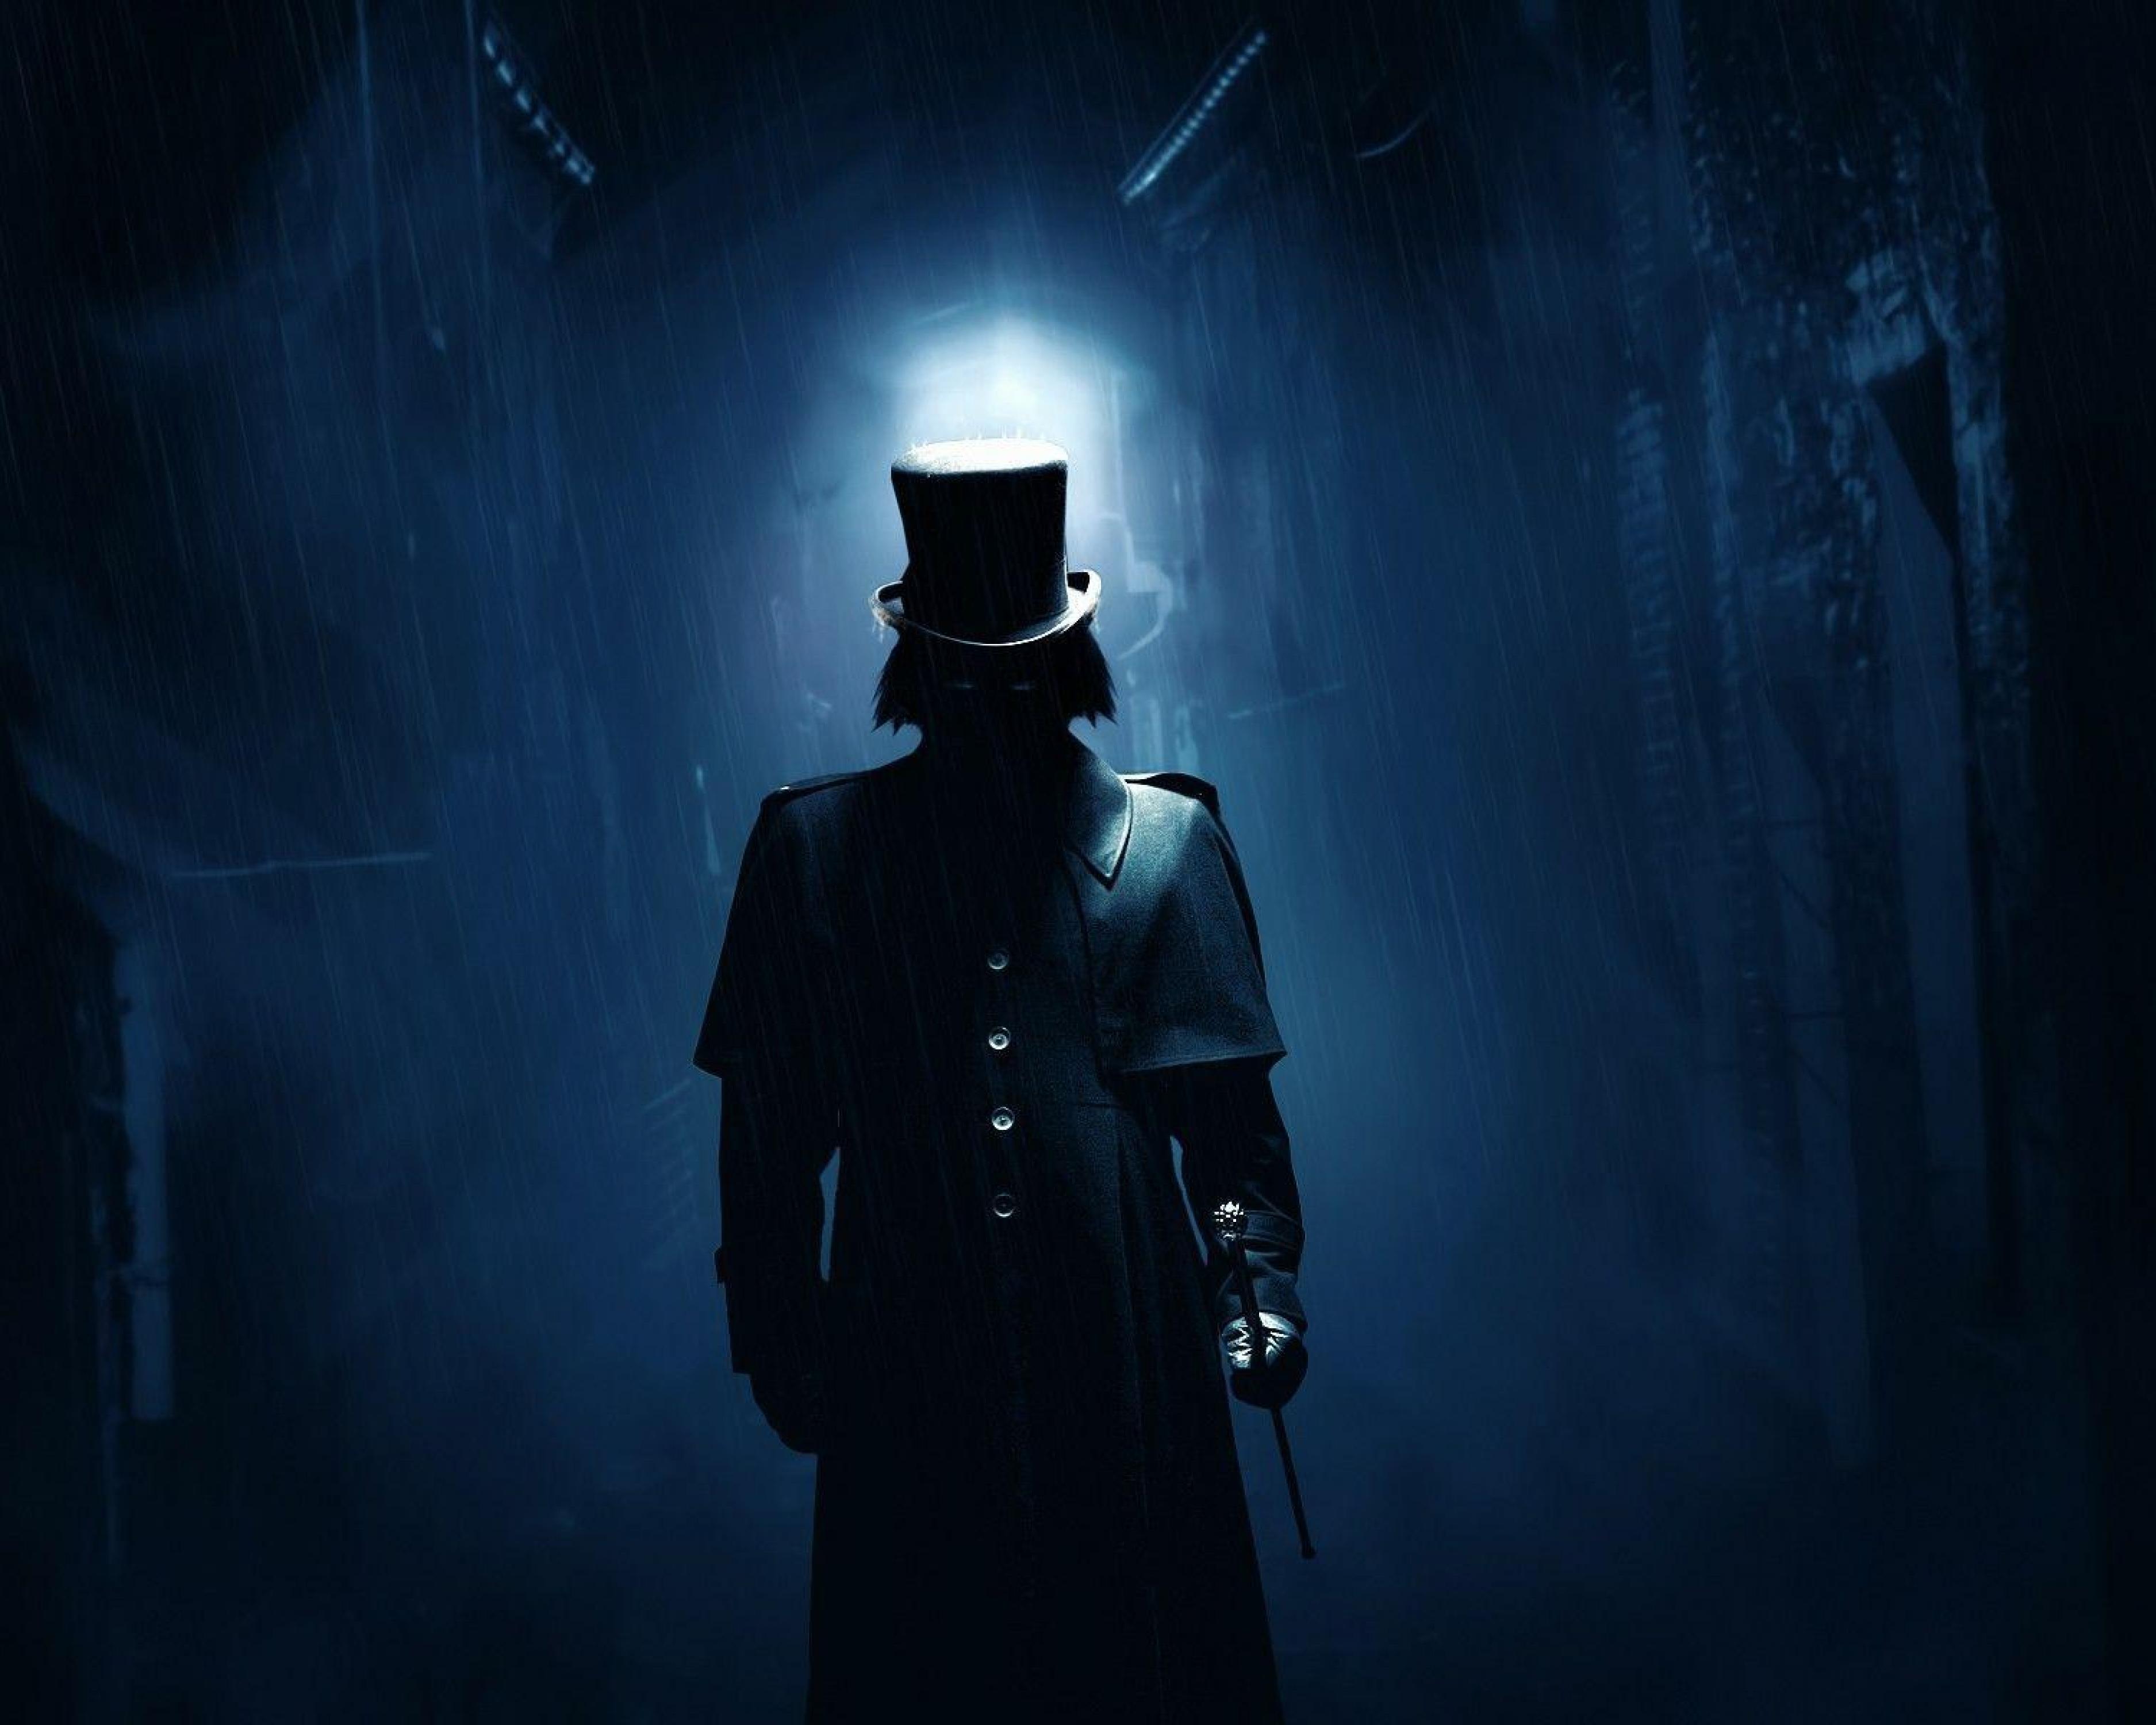 Abraham Abraham lincoln vampire hunter Lincoln Hunter 3750x3000